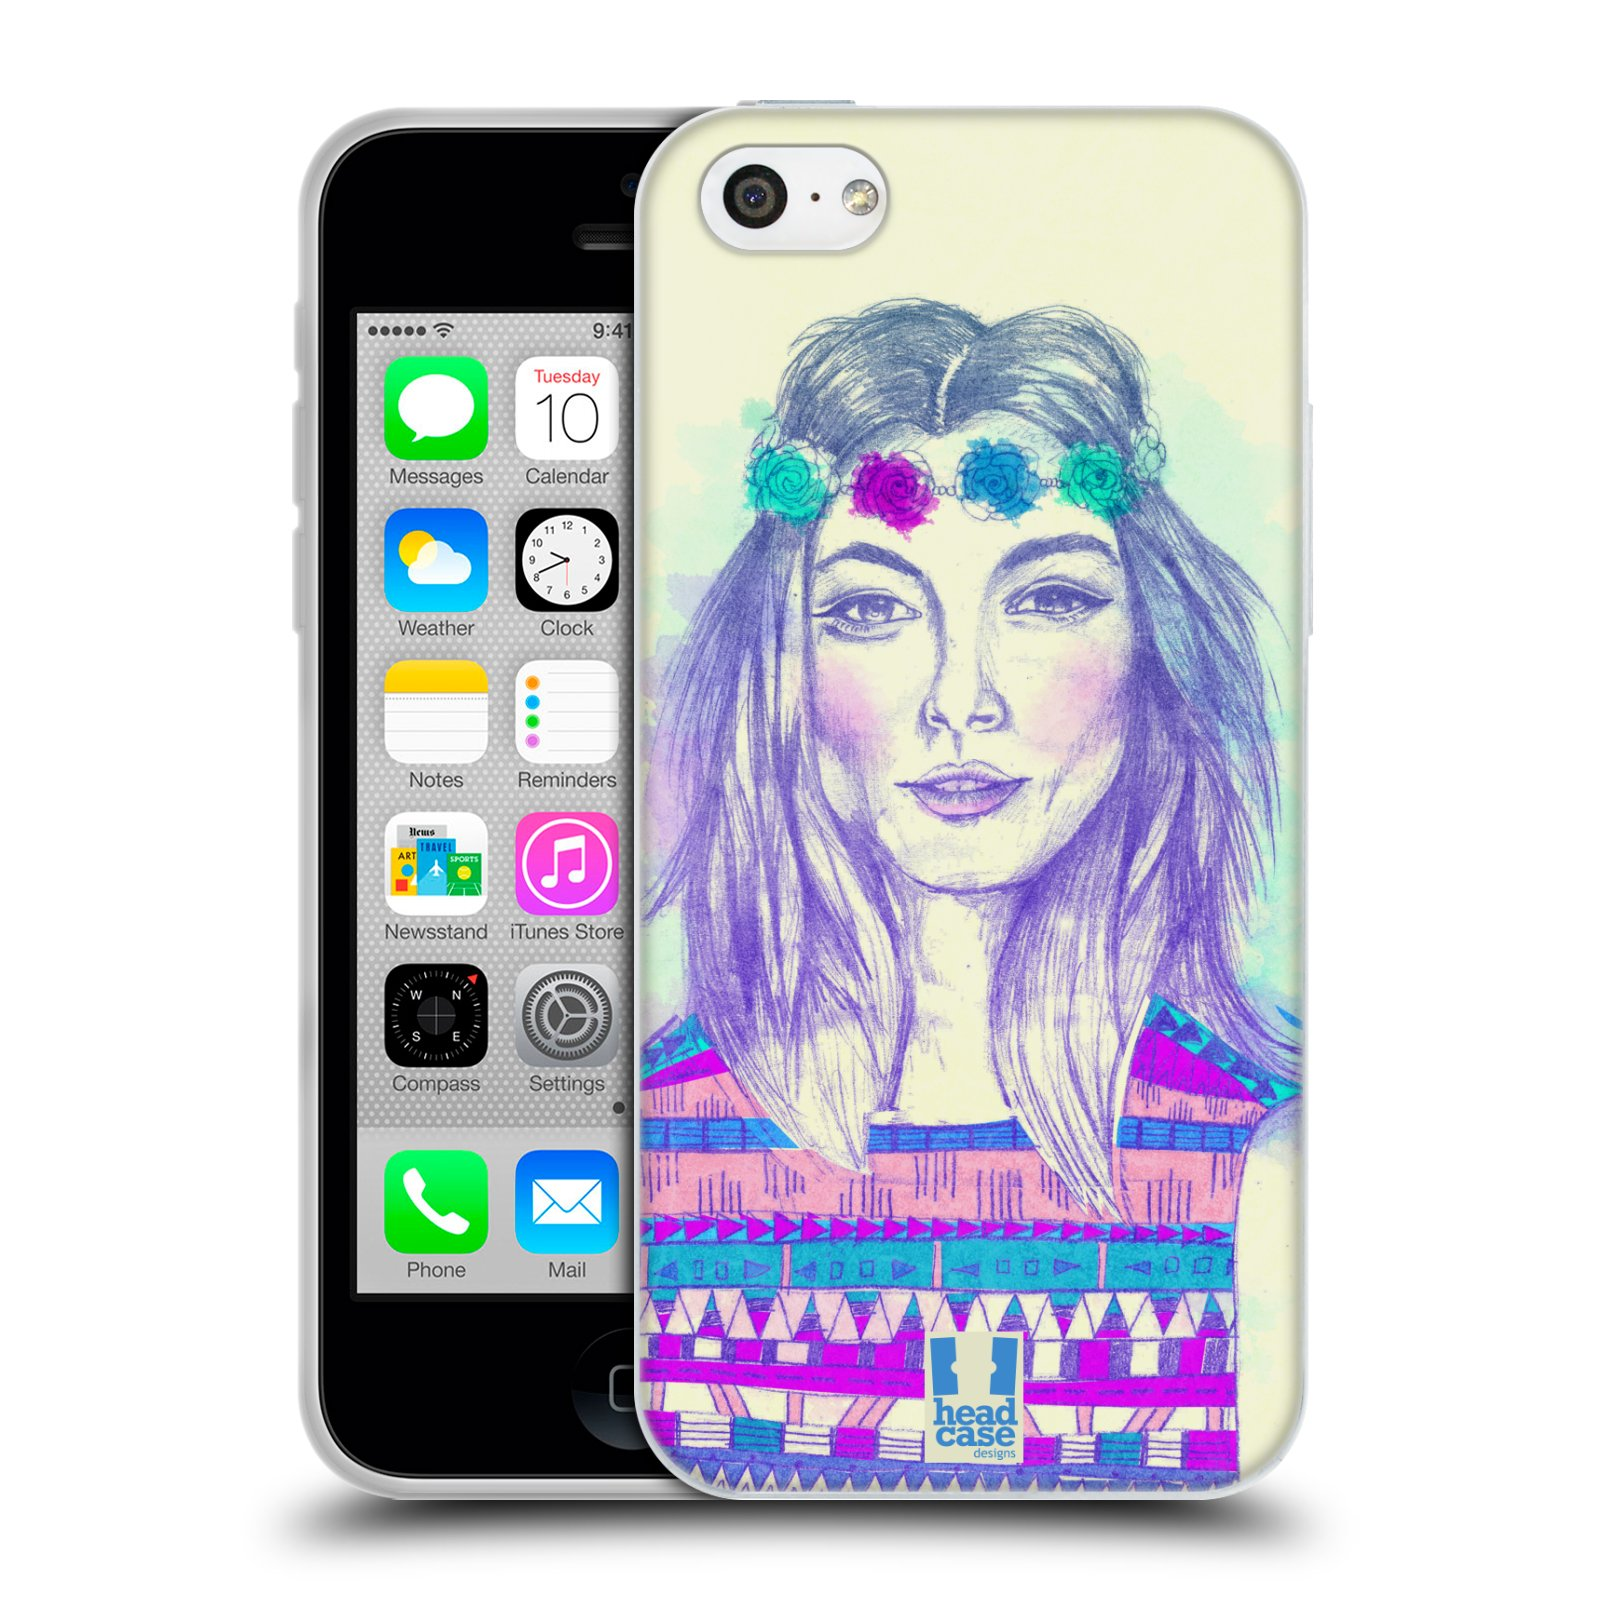 HEAD CASE silikonový obal na mobil Apple Iphone 5C vzor Dívka dlouhé květinové vlasy HIPPIE modrá